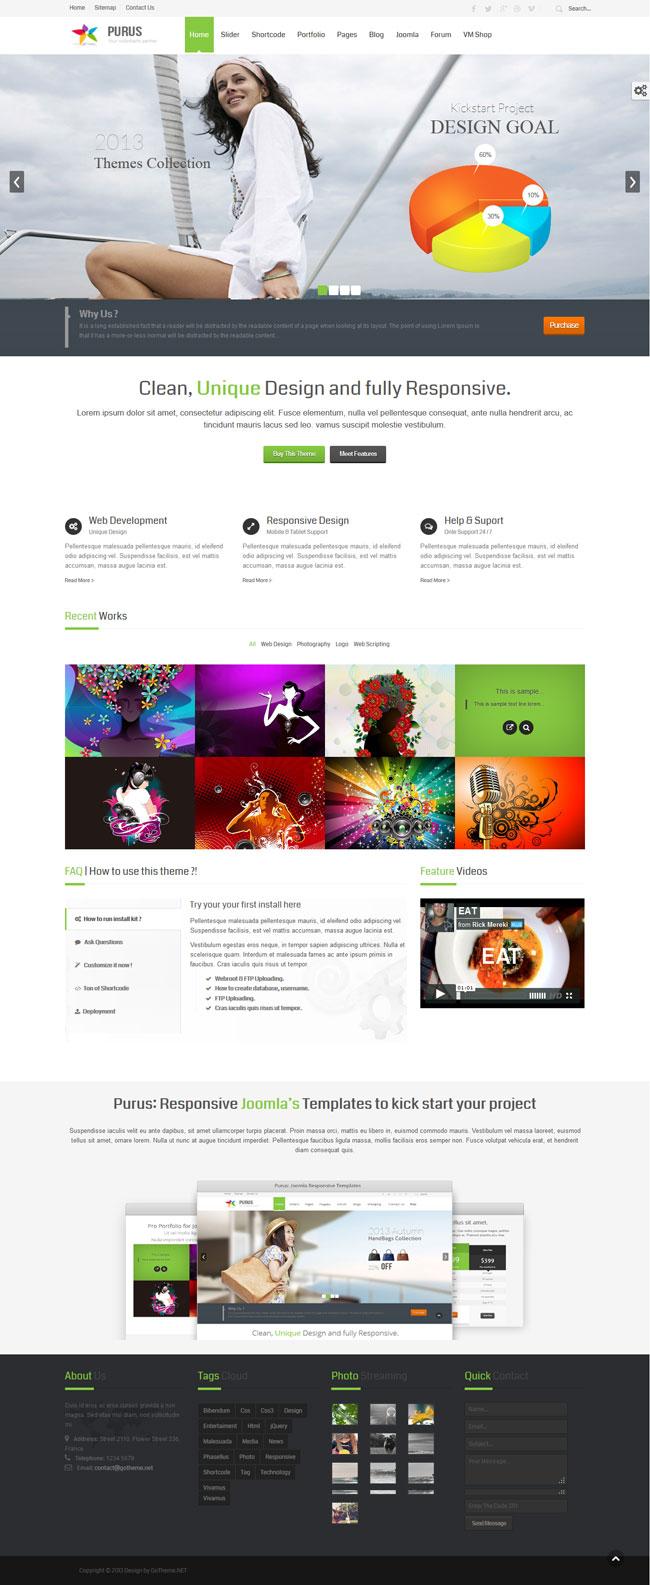 PURUS-Joomla Multipurpose Responsive Themes